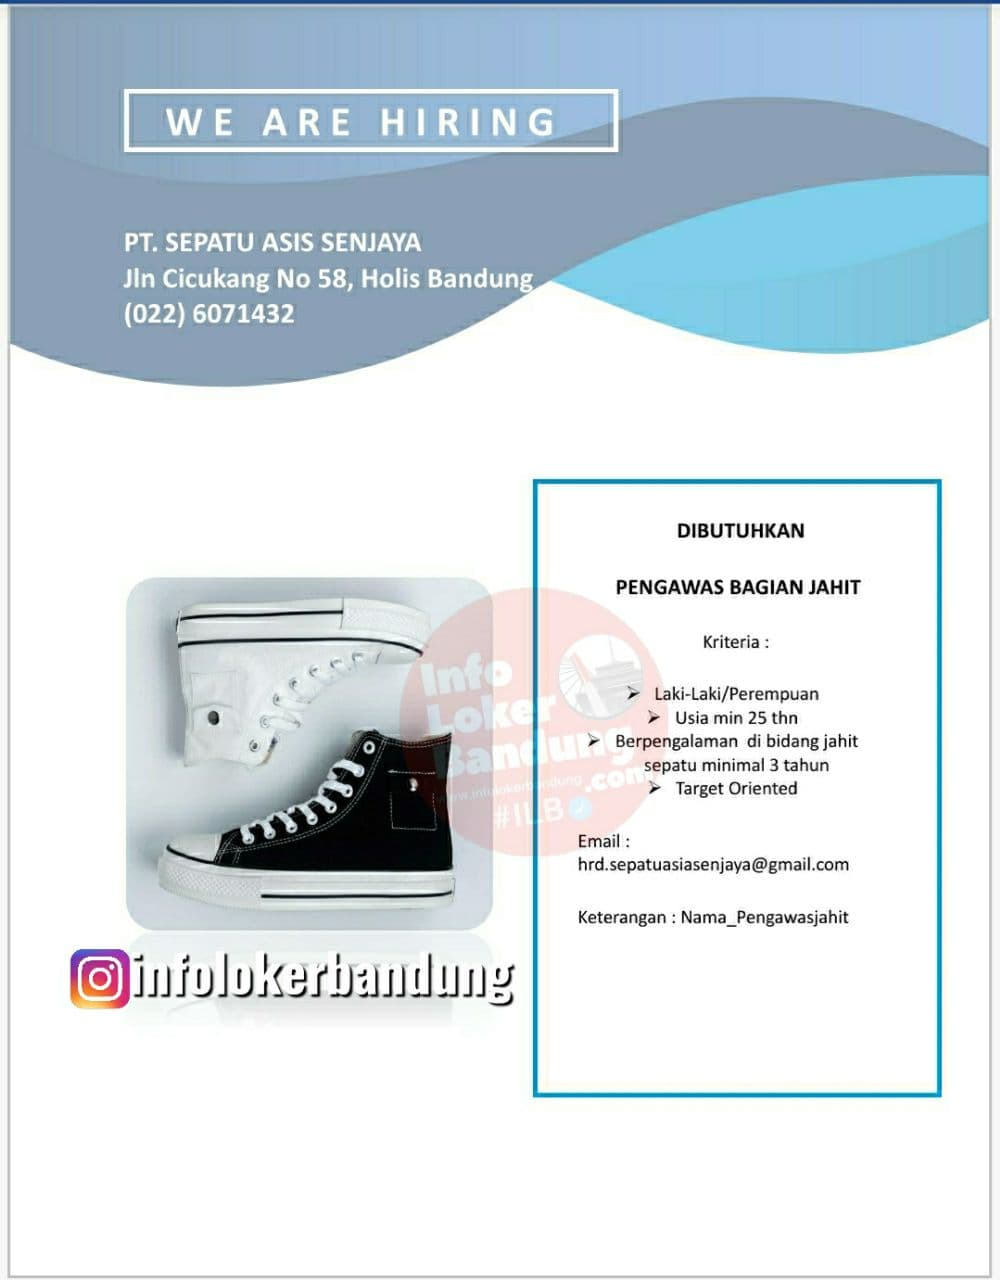 Lowongan Kerja PT. Sepatu Asia Senjaya Bandung Agustus 2021